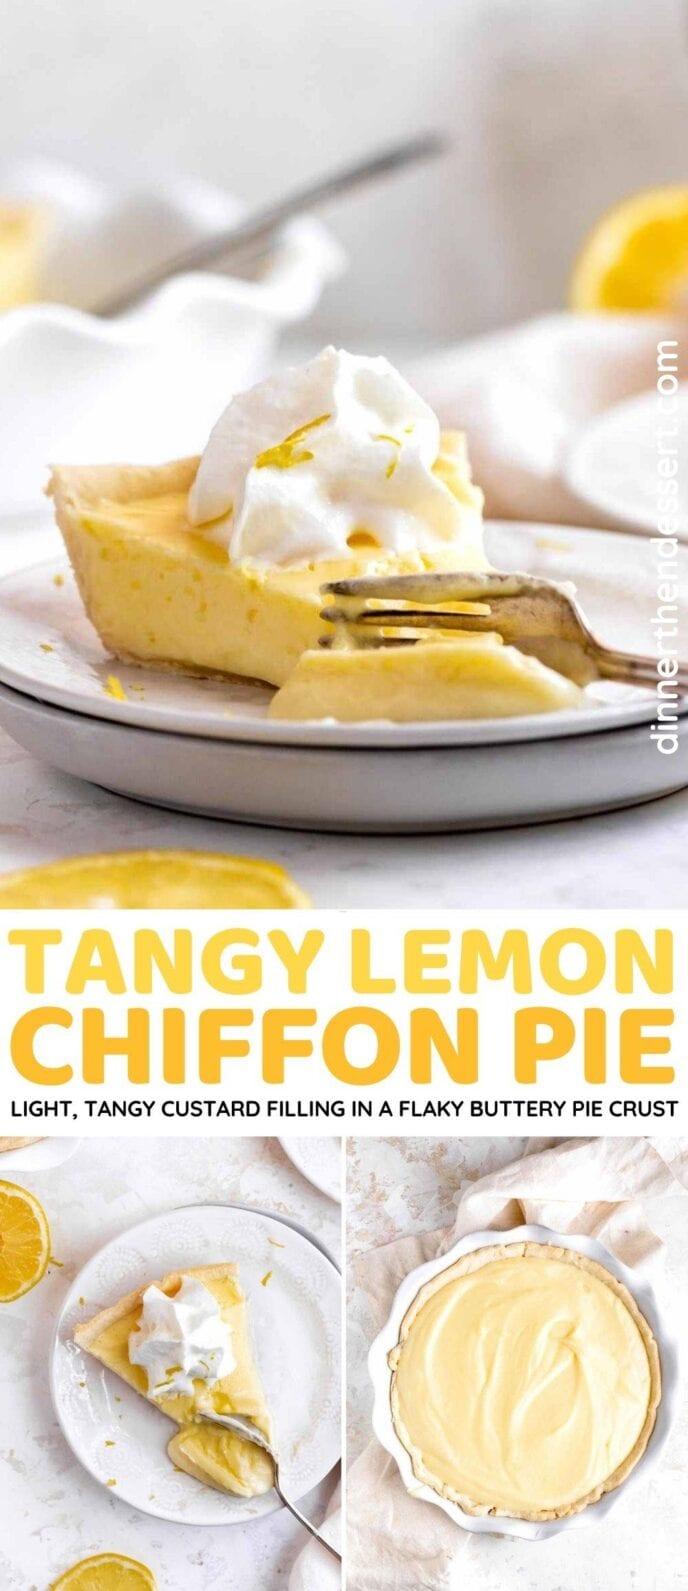 Tangy Lemon Chiffon Pie collage